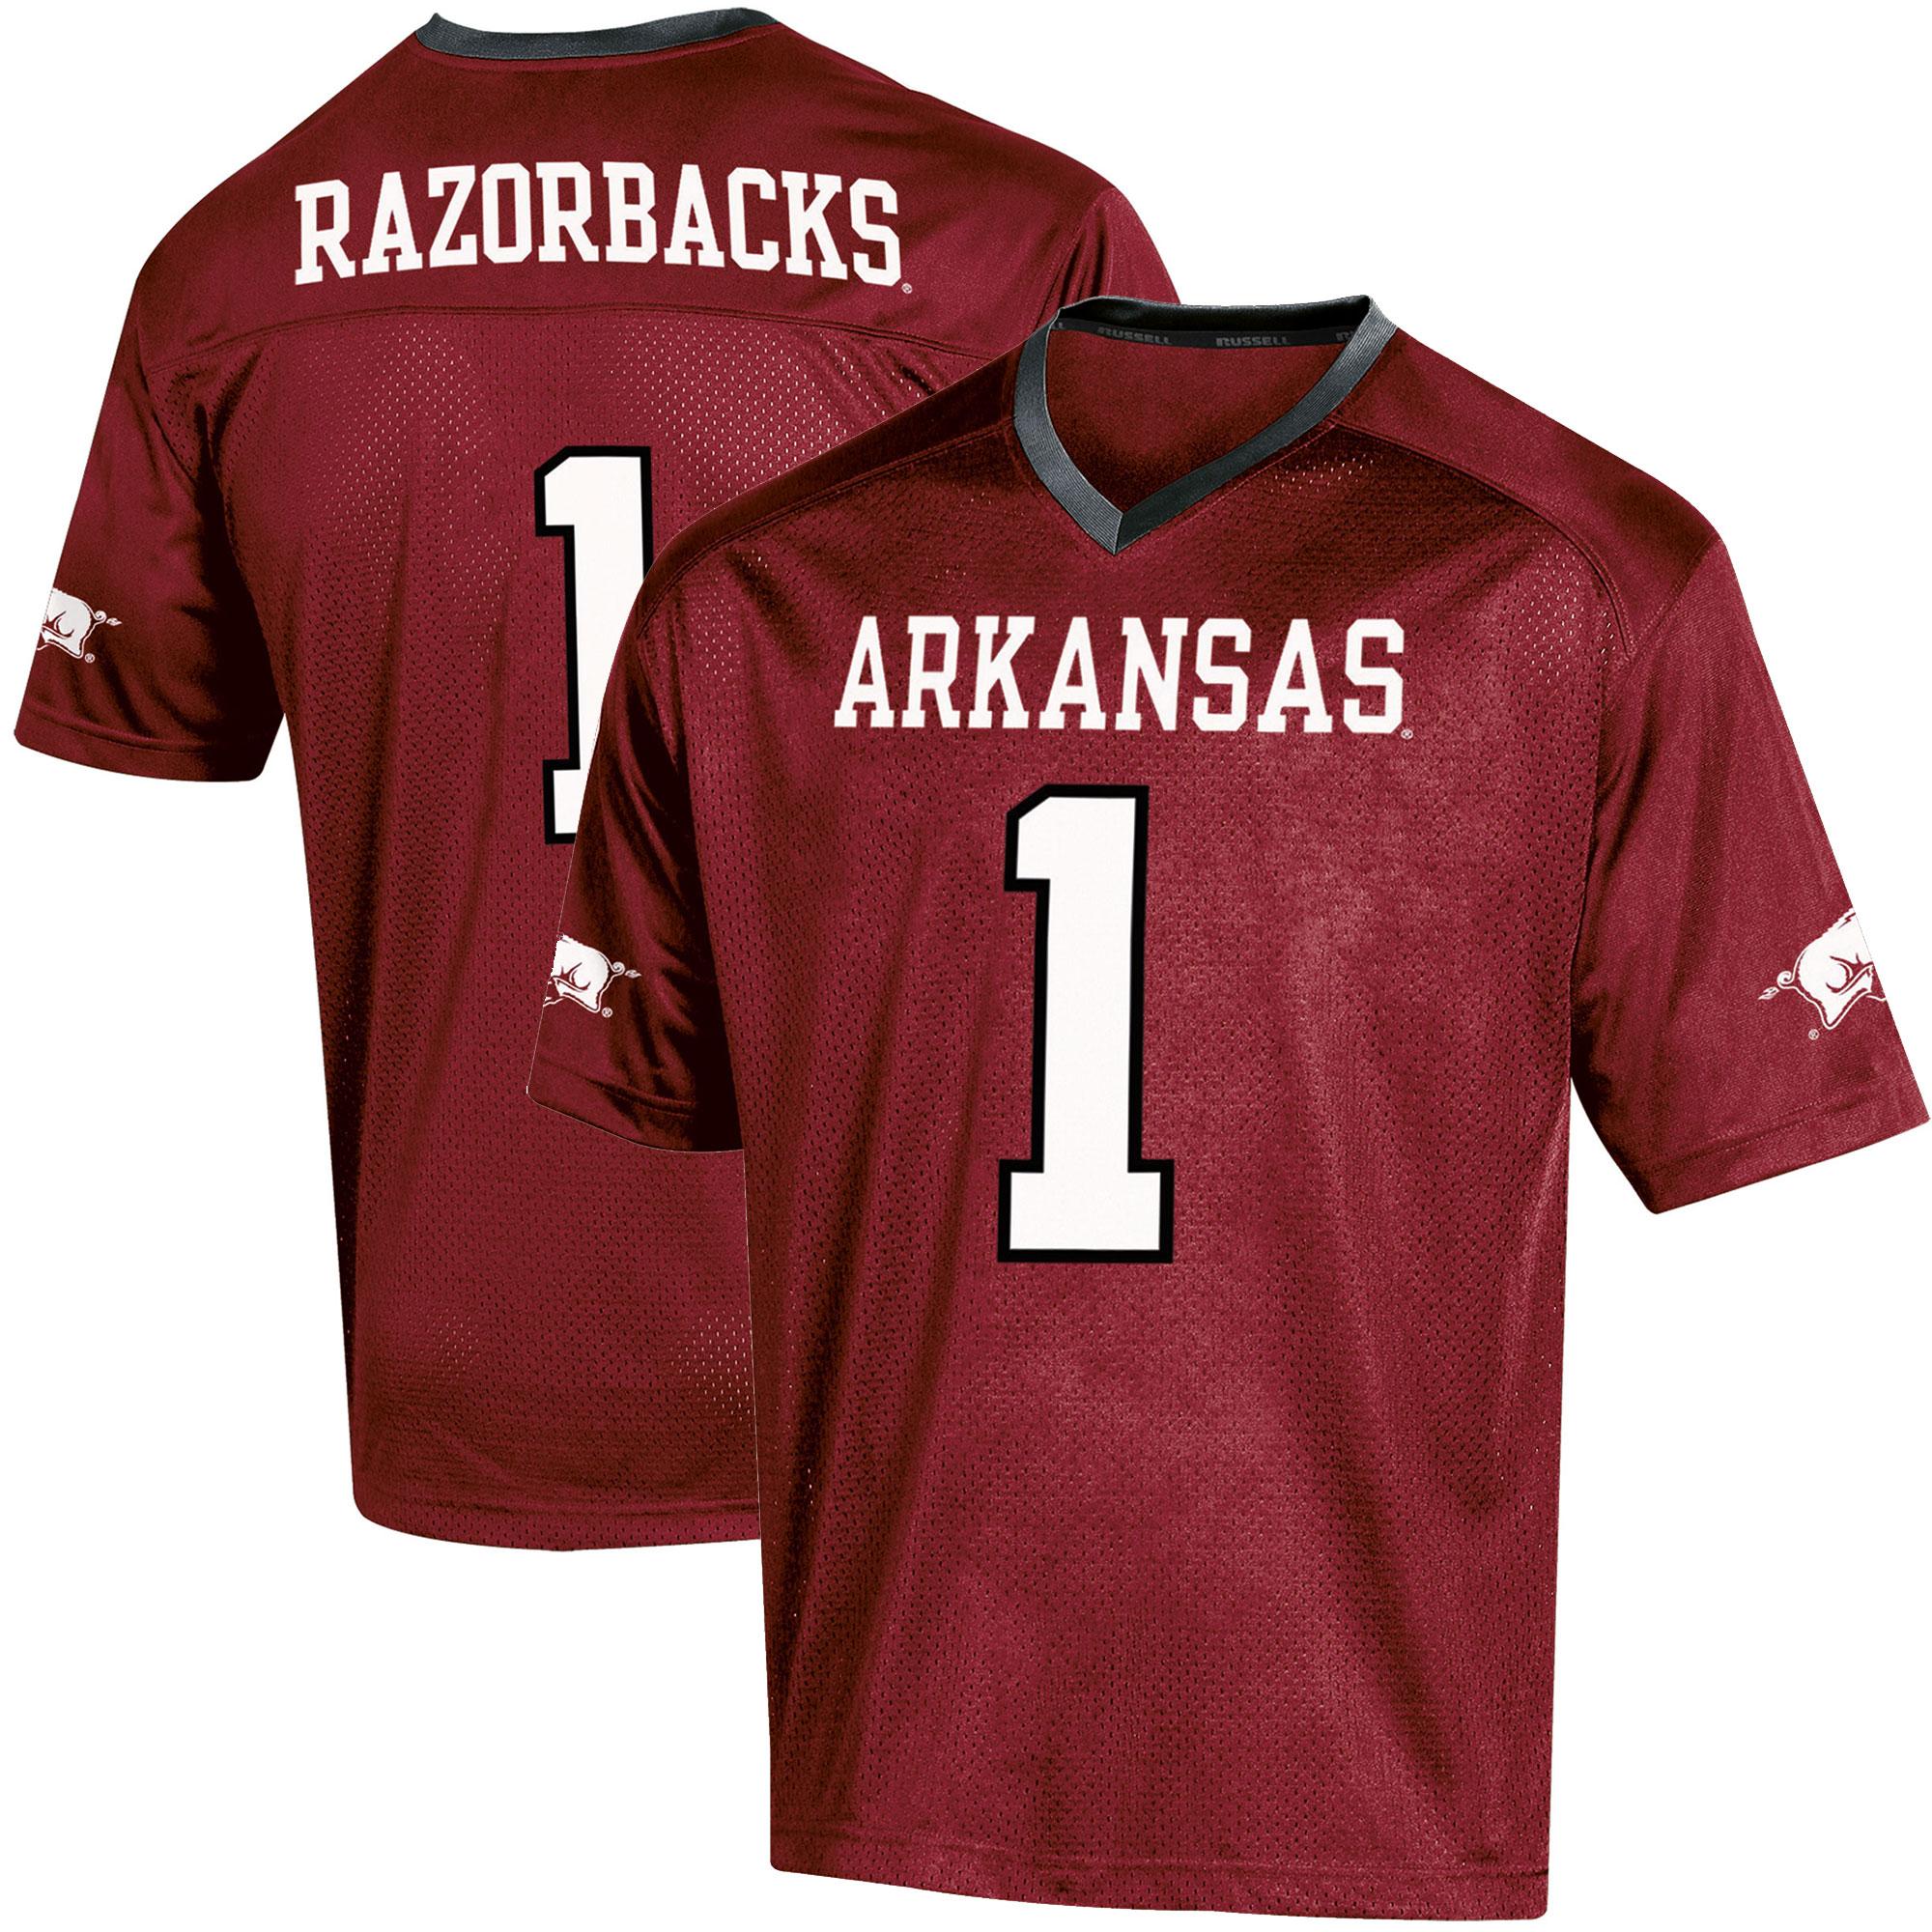 Toddler Russell Cardinal Arkansas Razorbacks Replica Football Jersey